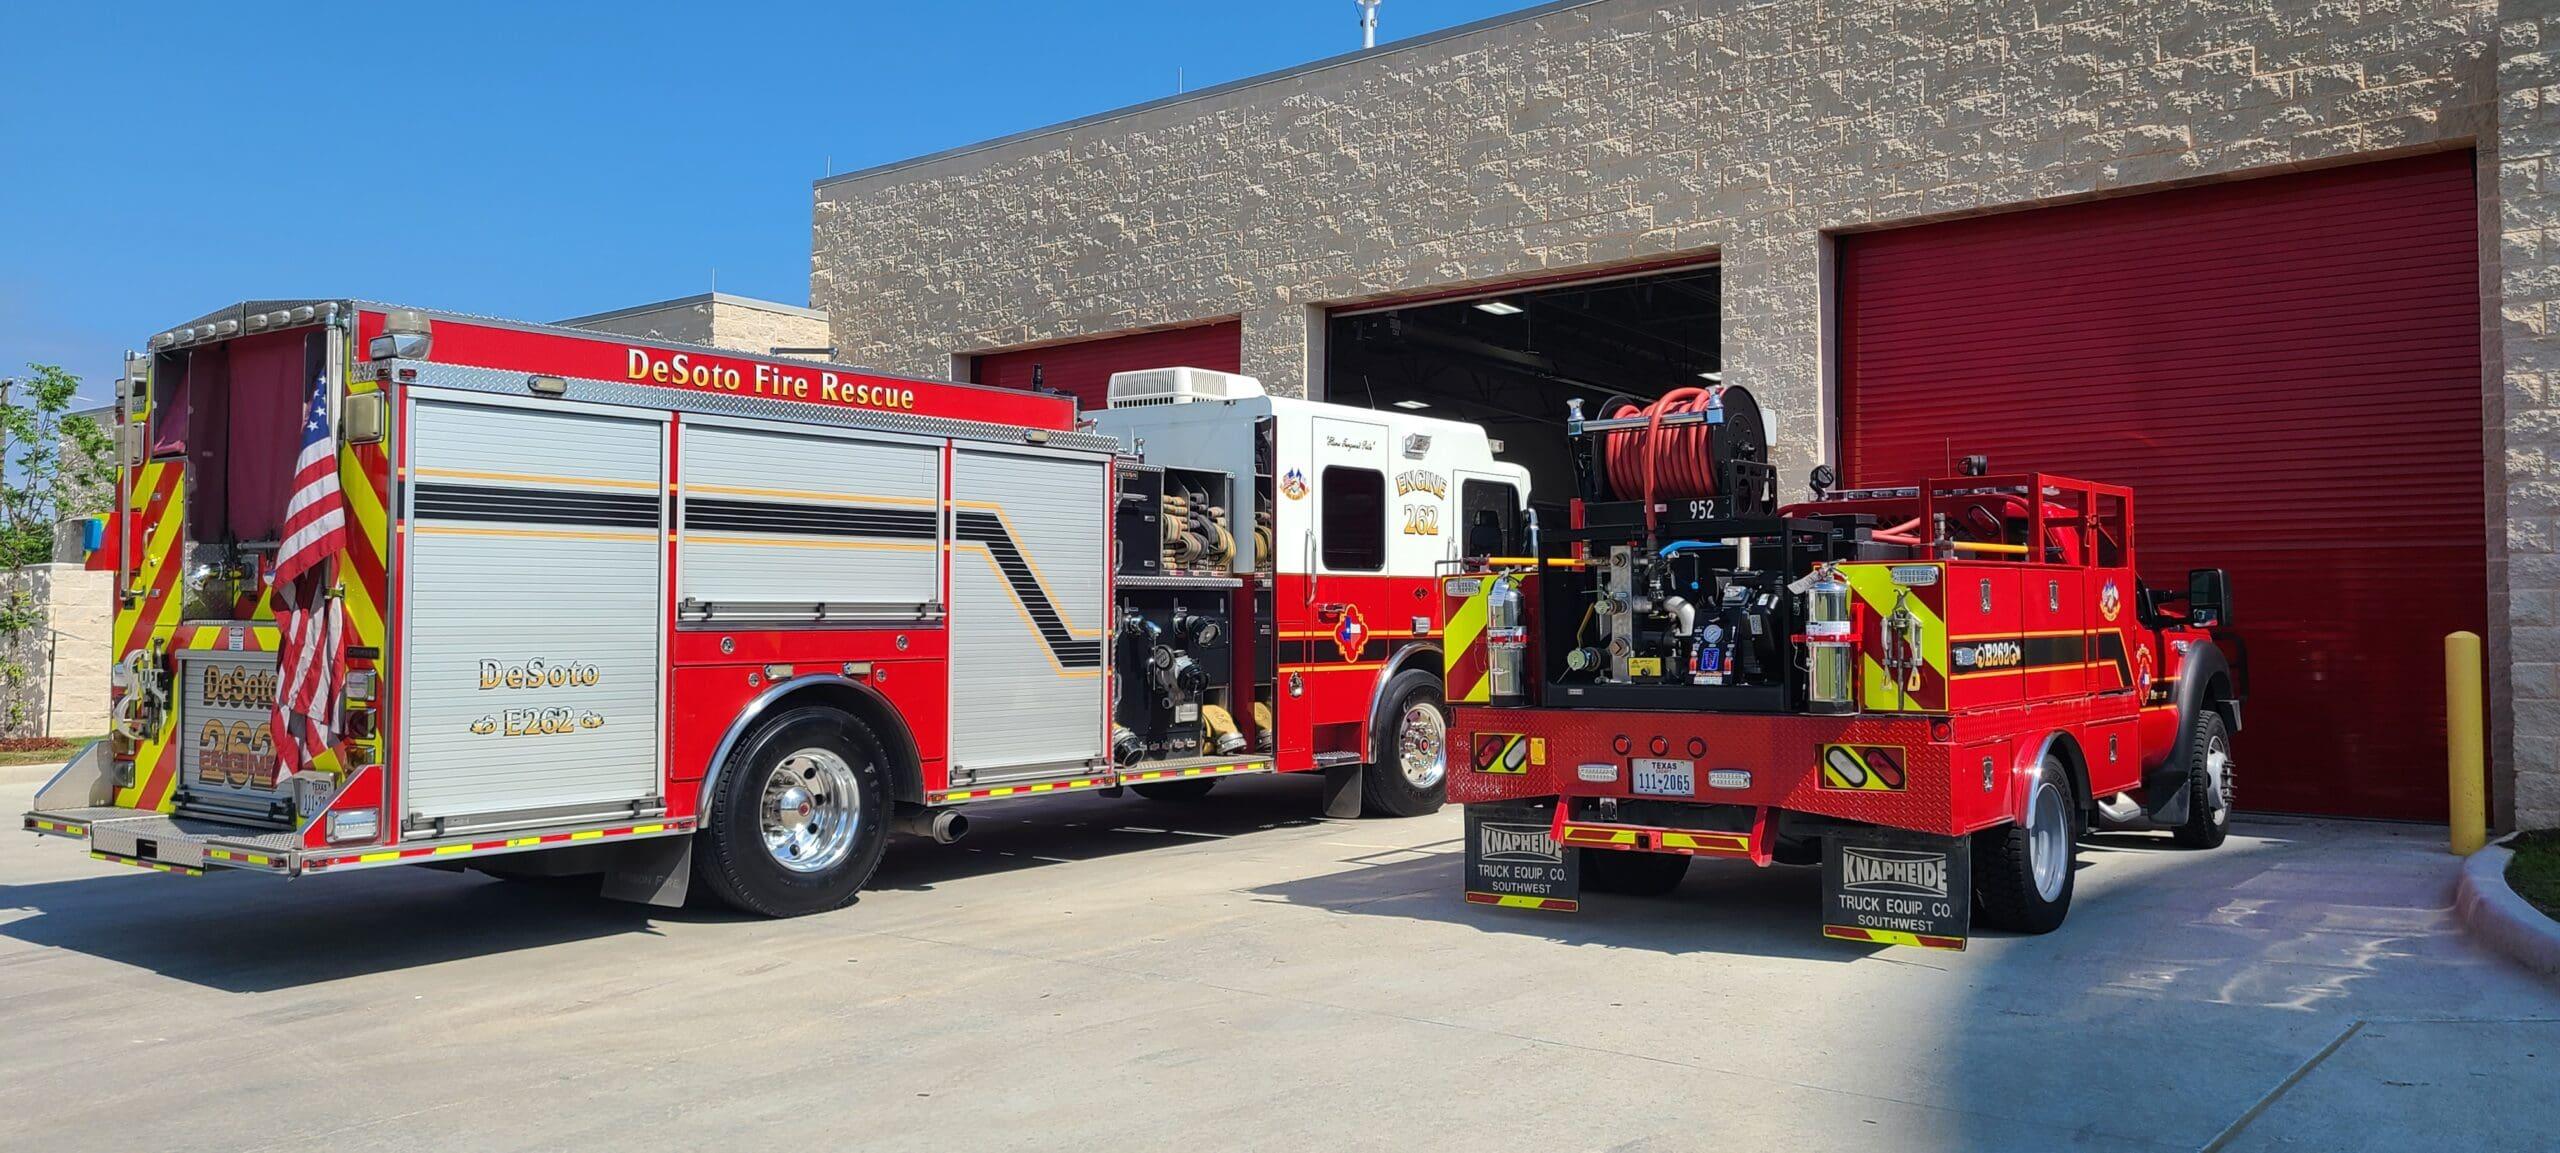 Trucks at DeSoto fire station